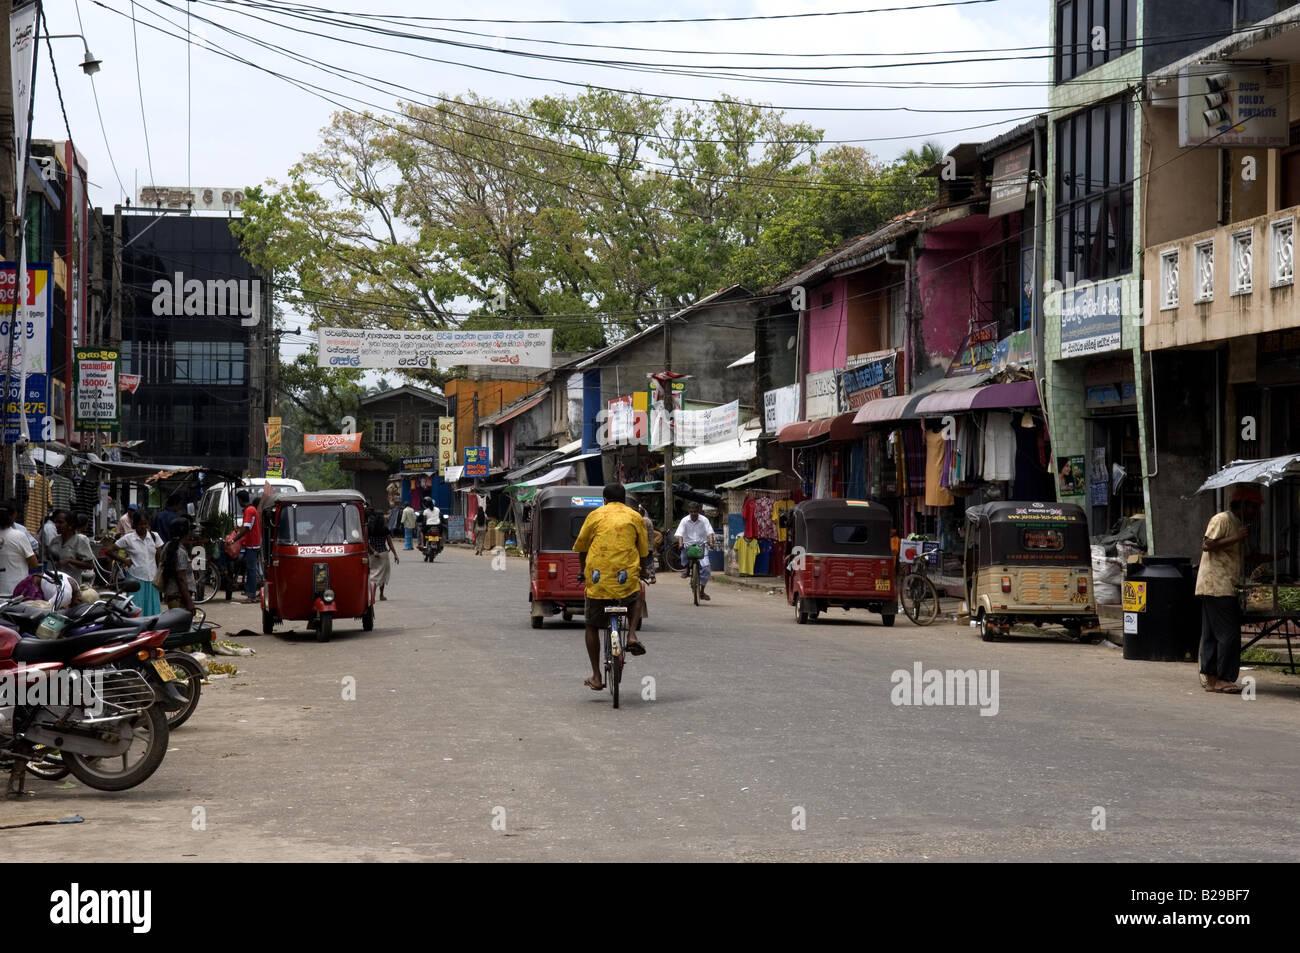 Aluthgama main street Sri Lanka Date 20 04 2008 Ref ZB648 115261 0012 COMPULSORY CREDIT World Pictures Photoshot - Stock Image